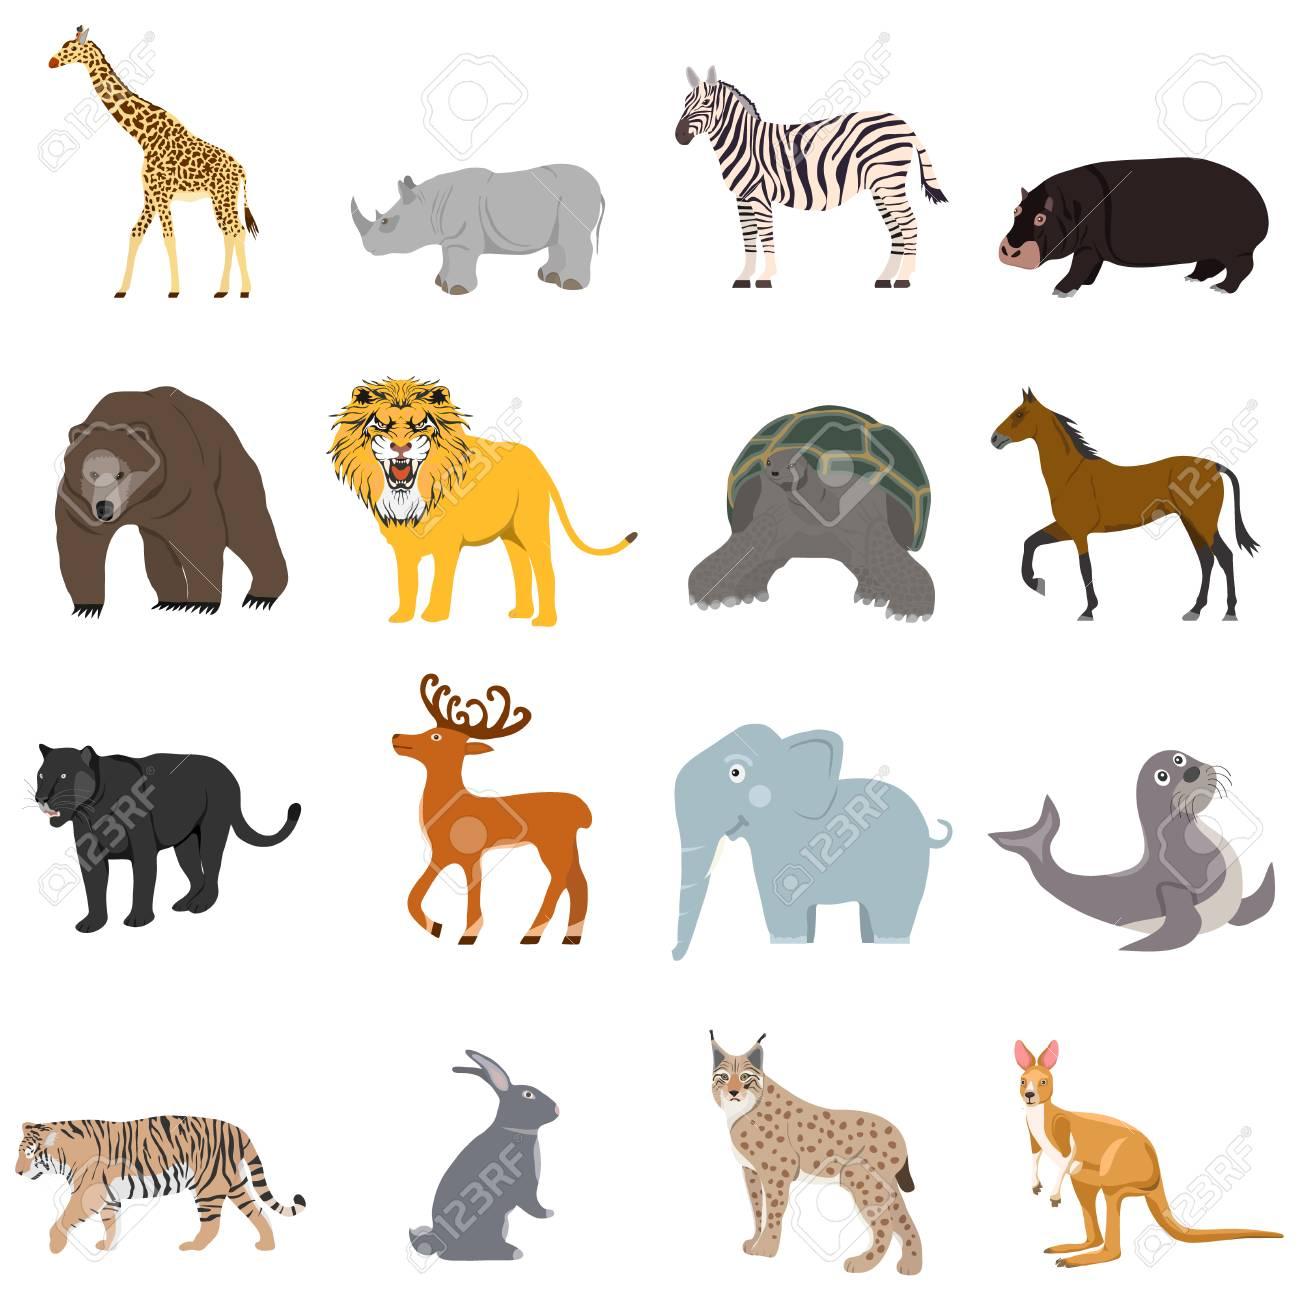 Animals, a large set of animals. Cartoon illustration of animals. - 122403771